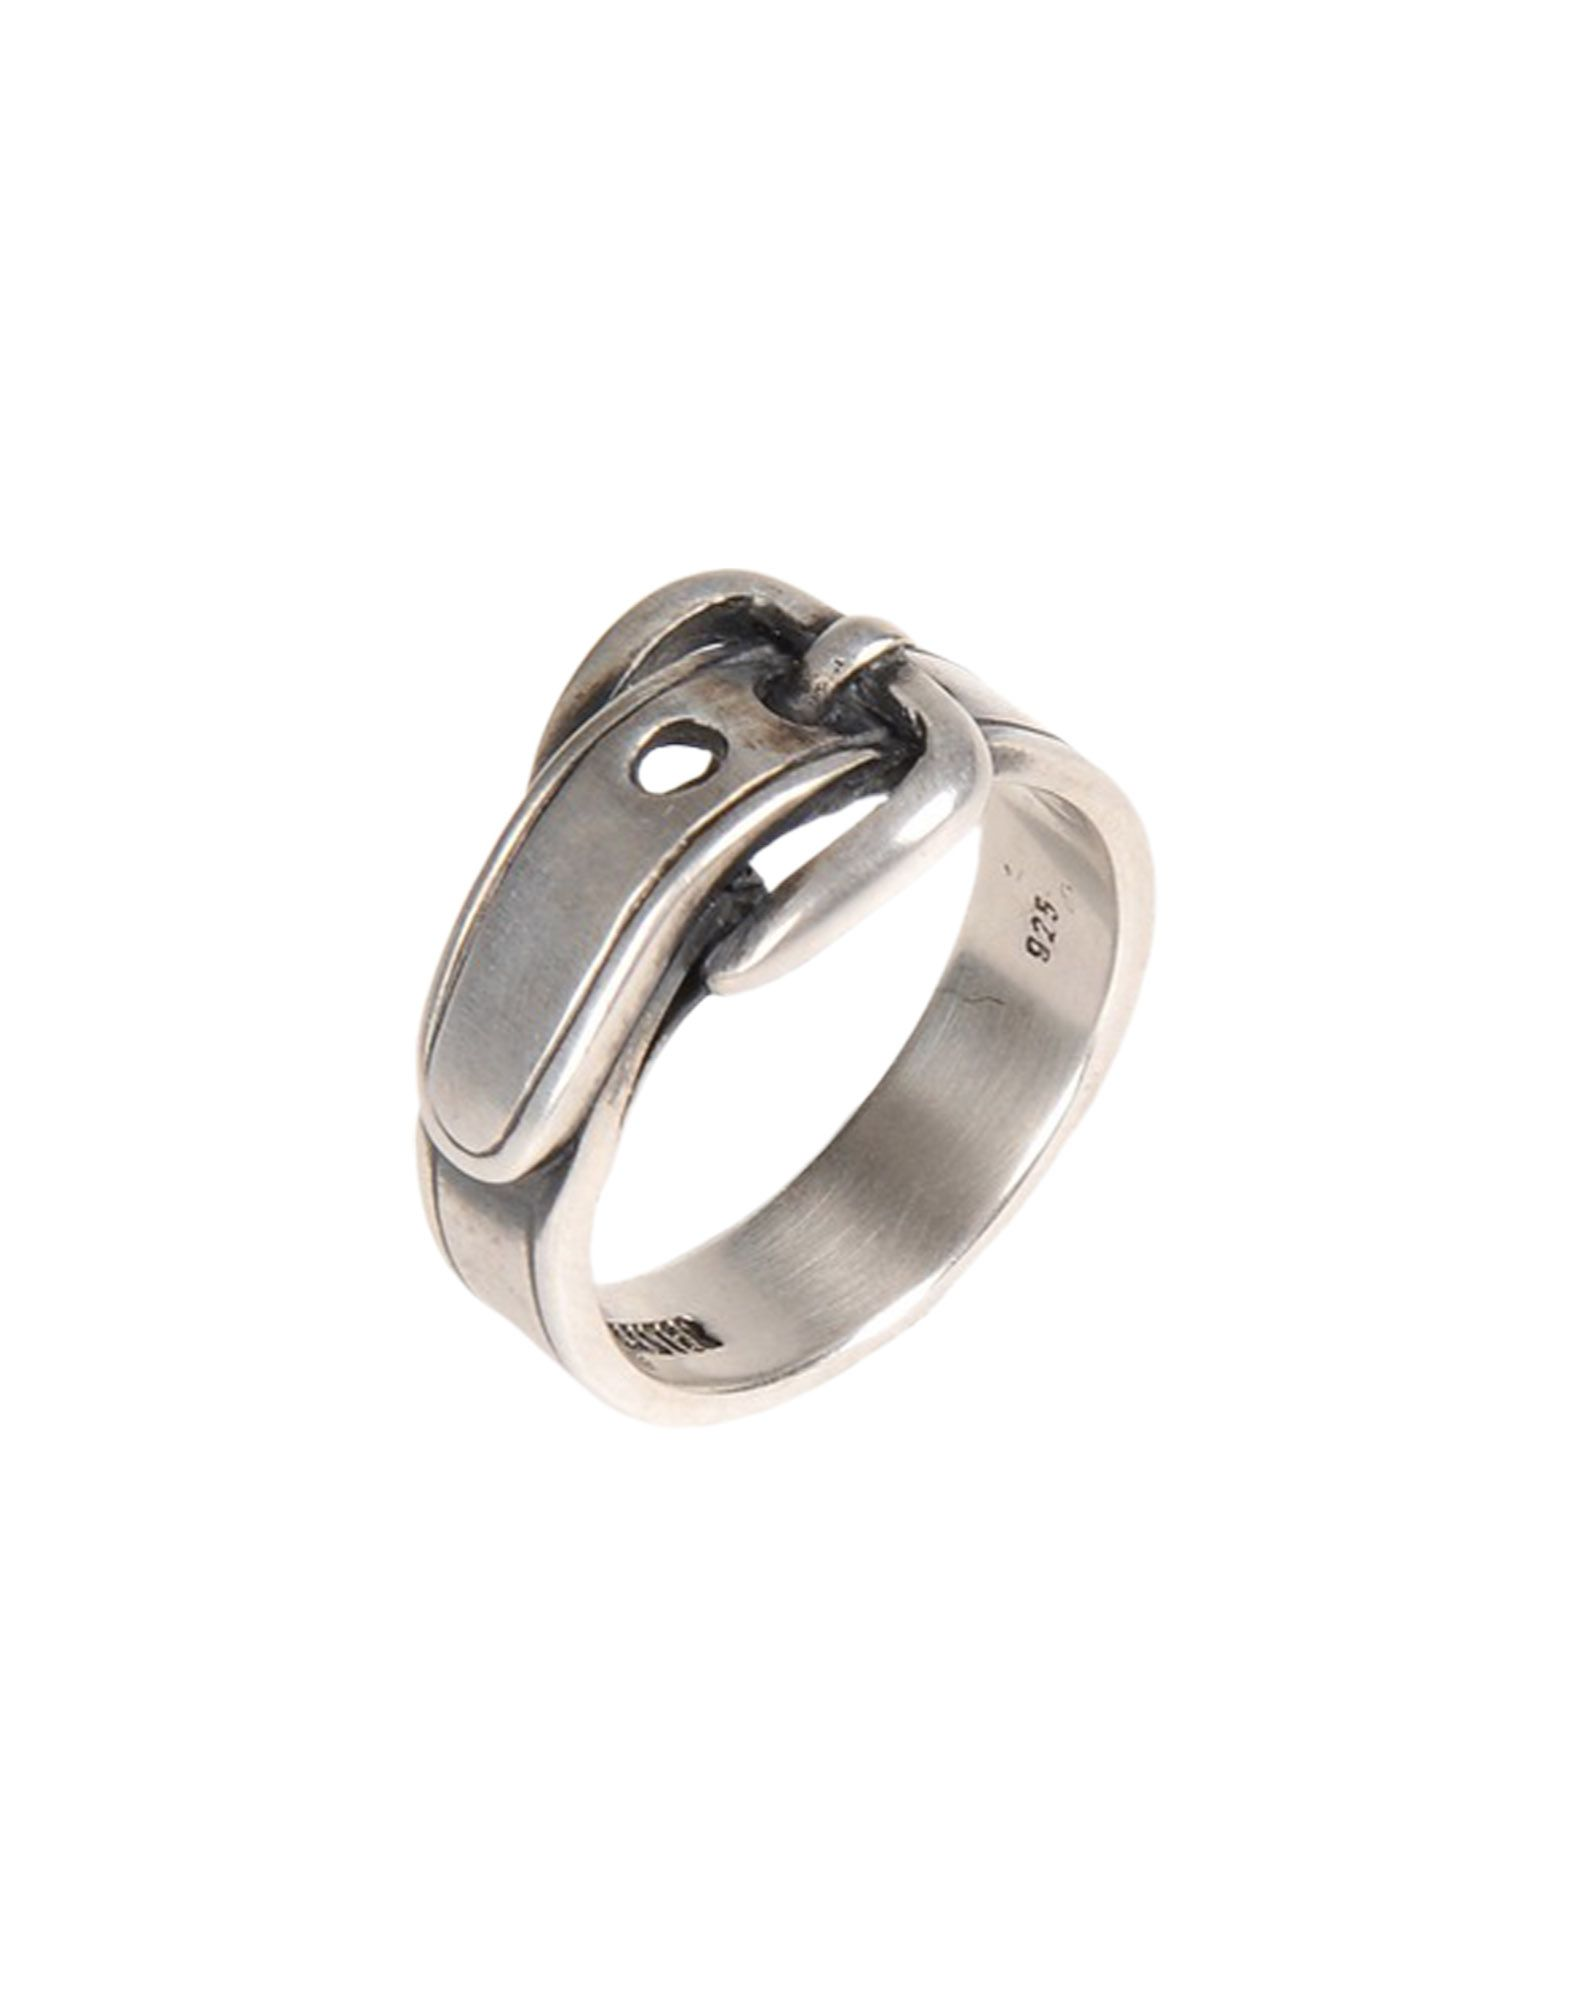 ANN DEMEULEMEESTER メンズ 指輪 シルバー 3 金属